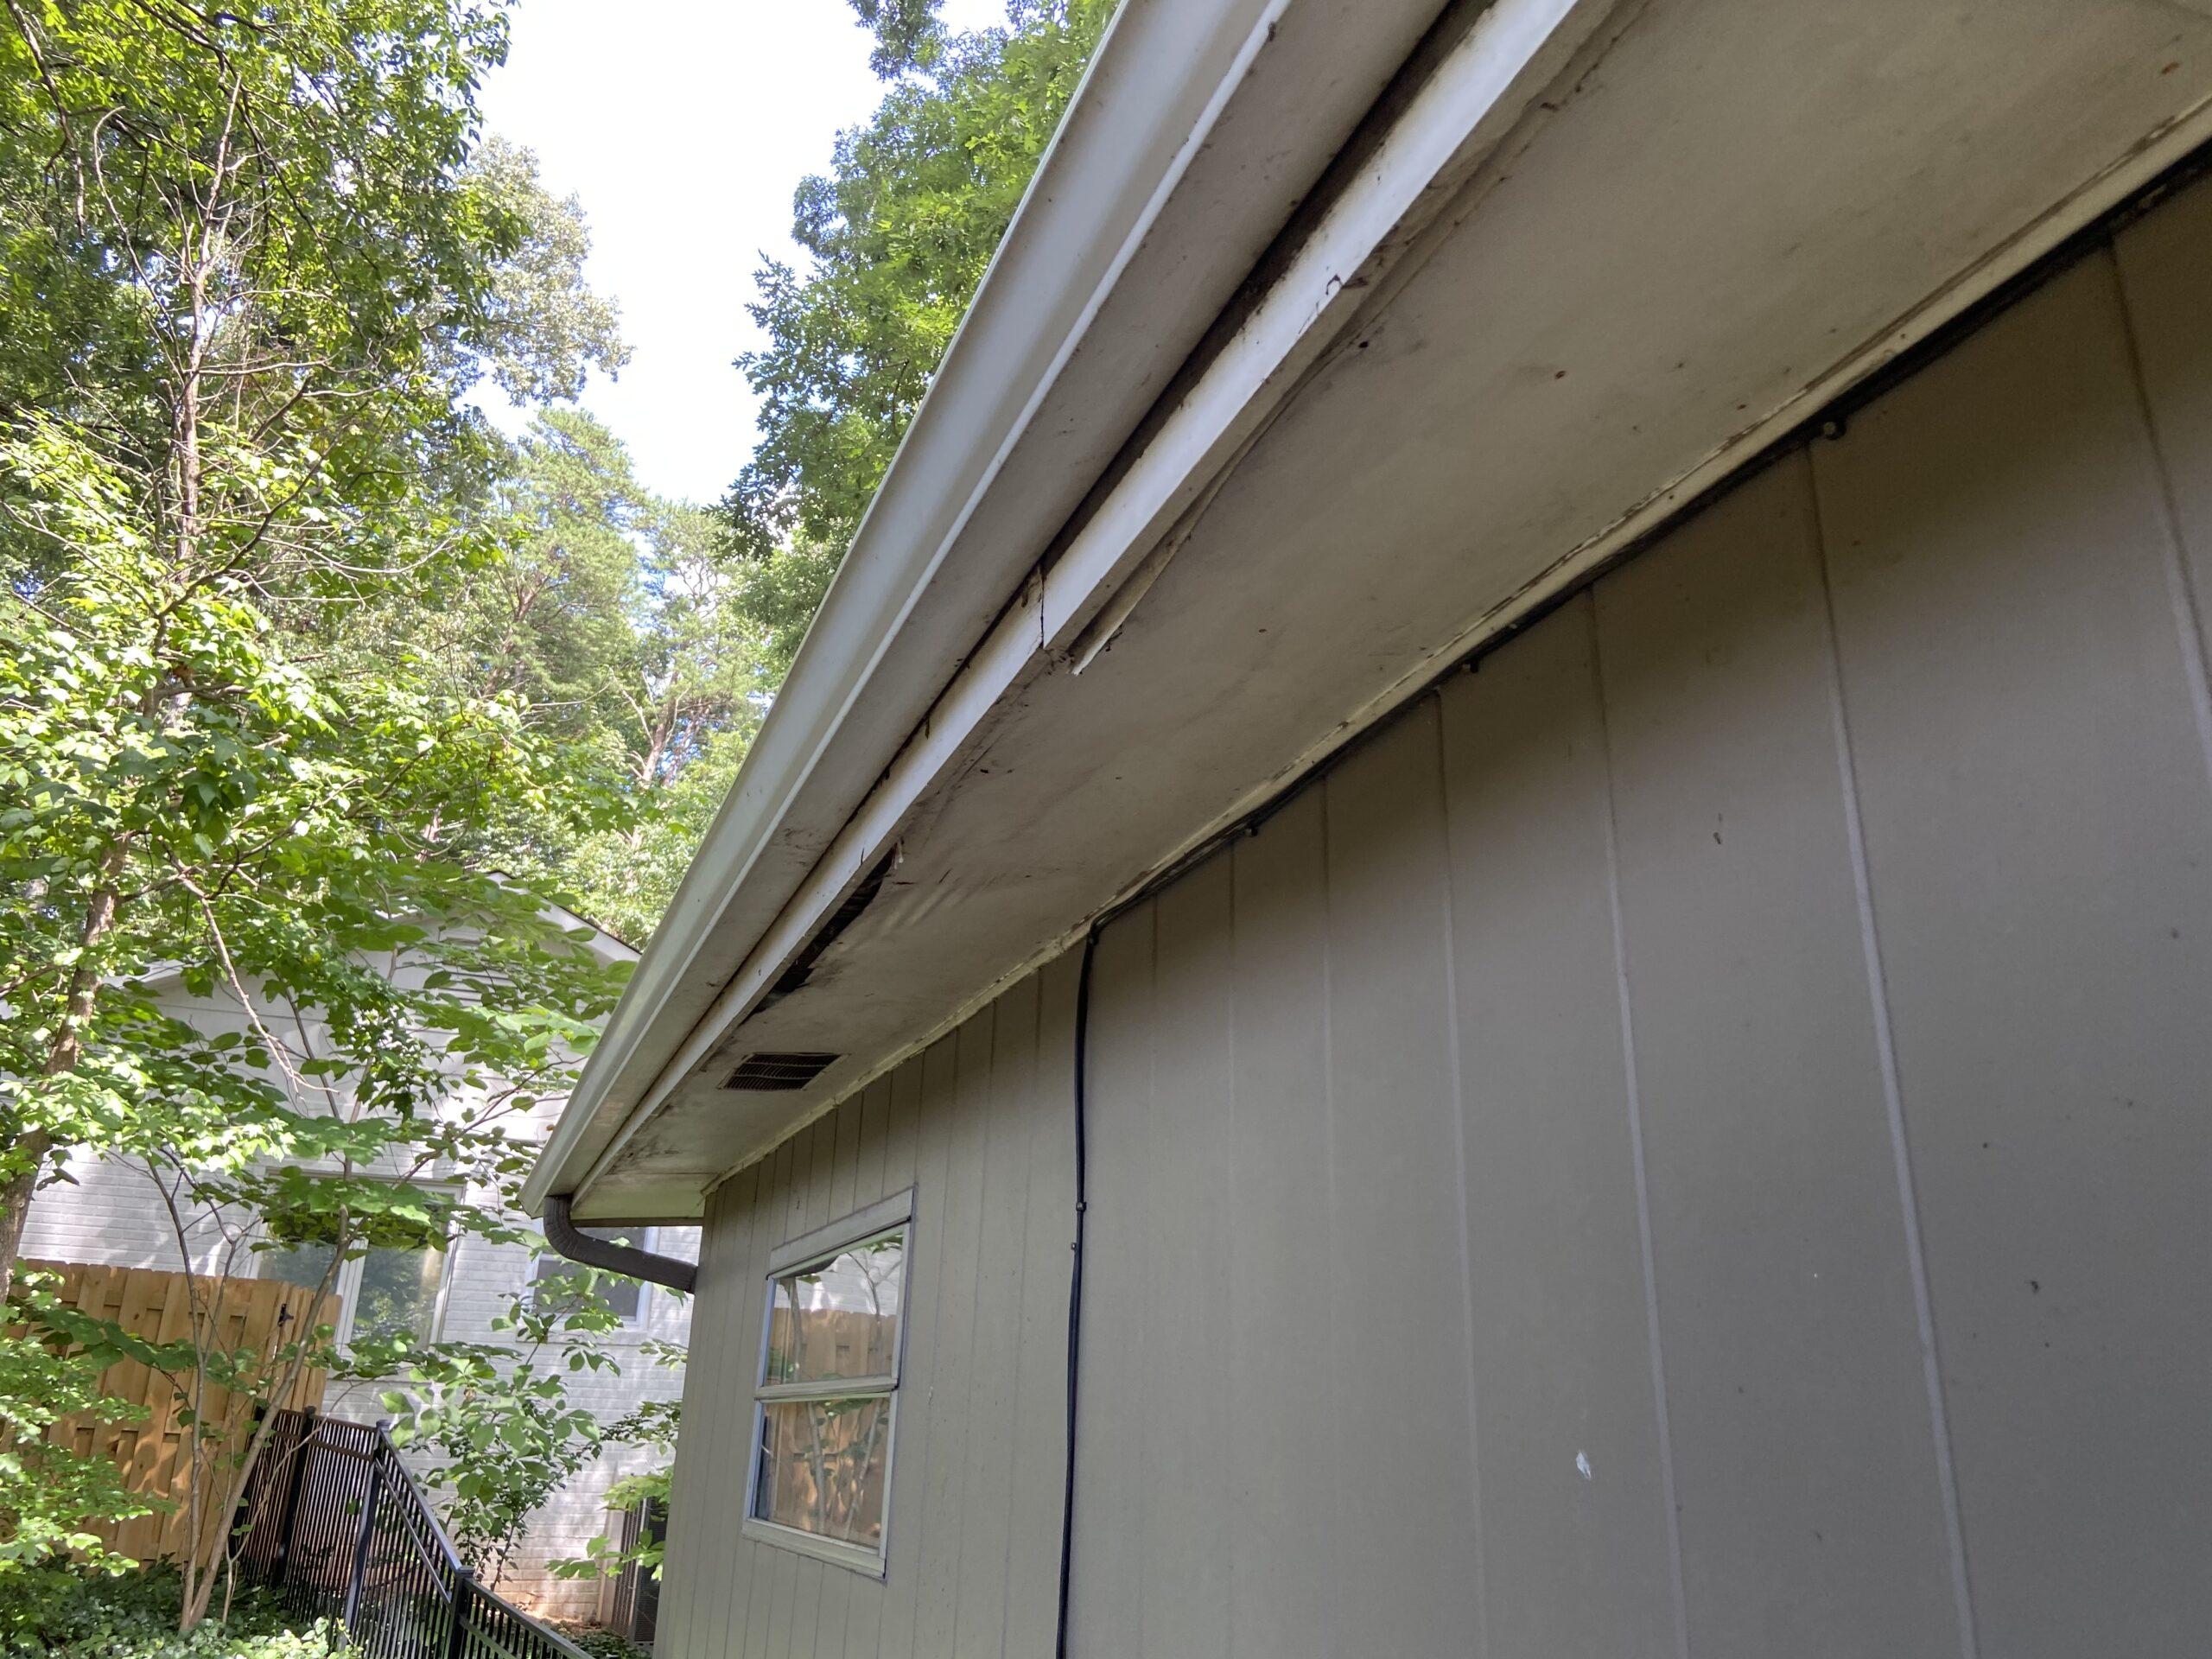 Roof leak on edge of roof causing leaks